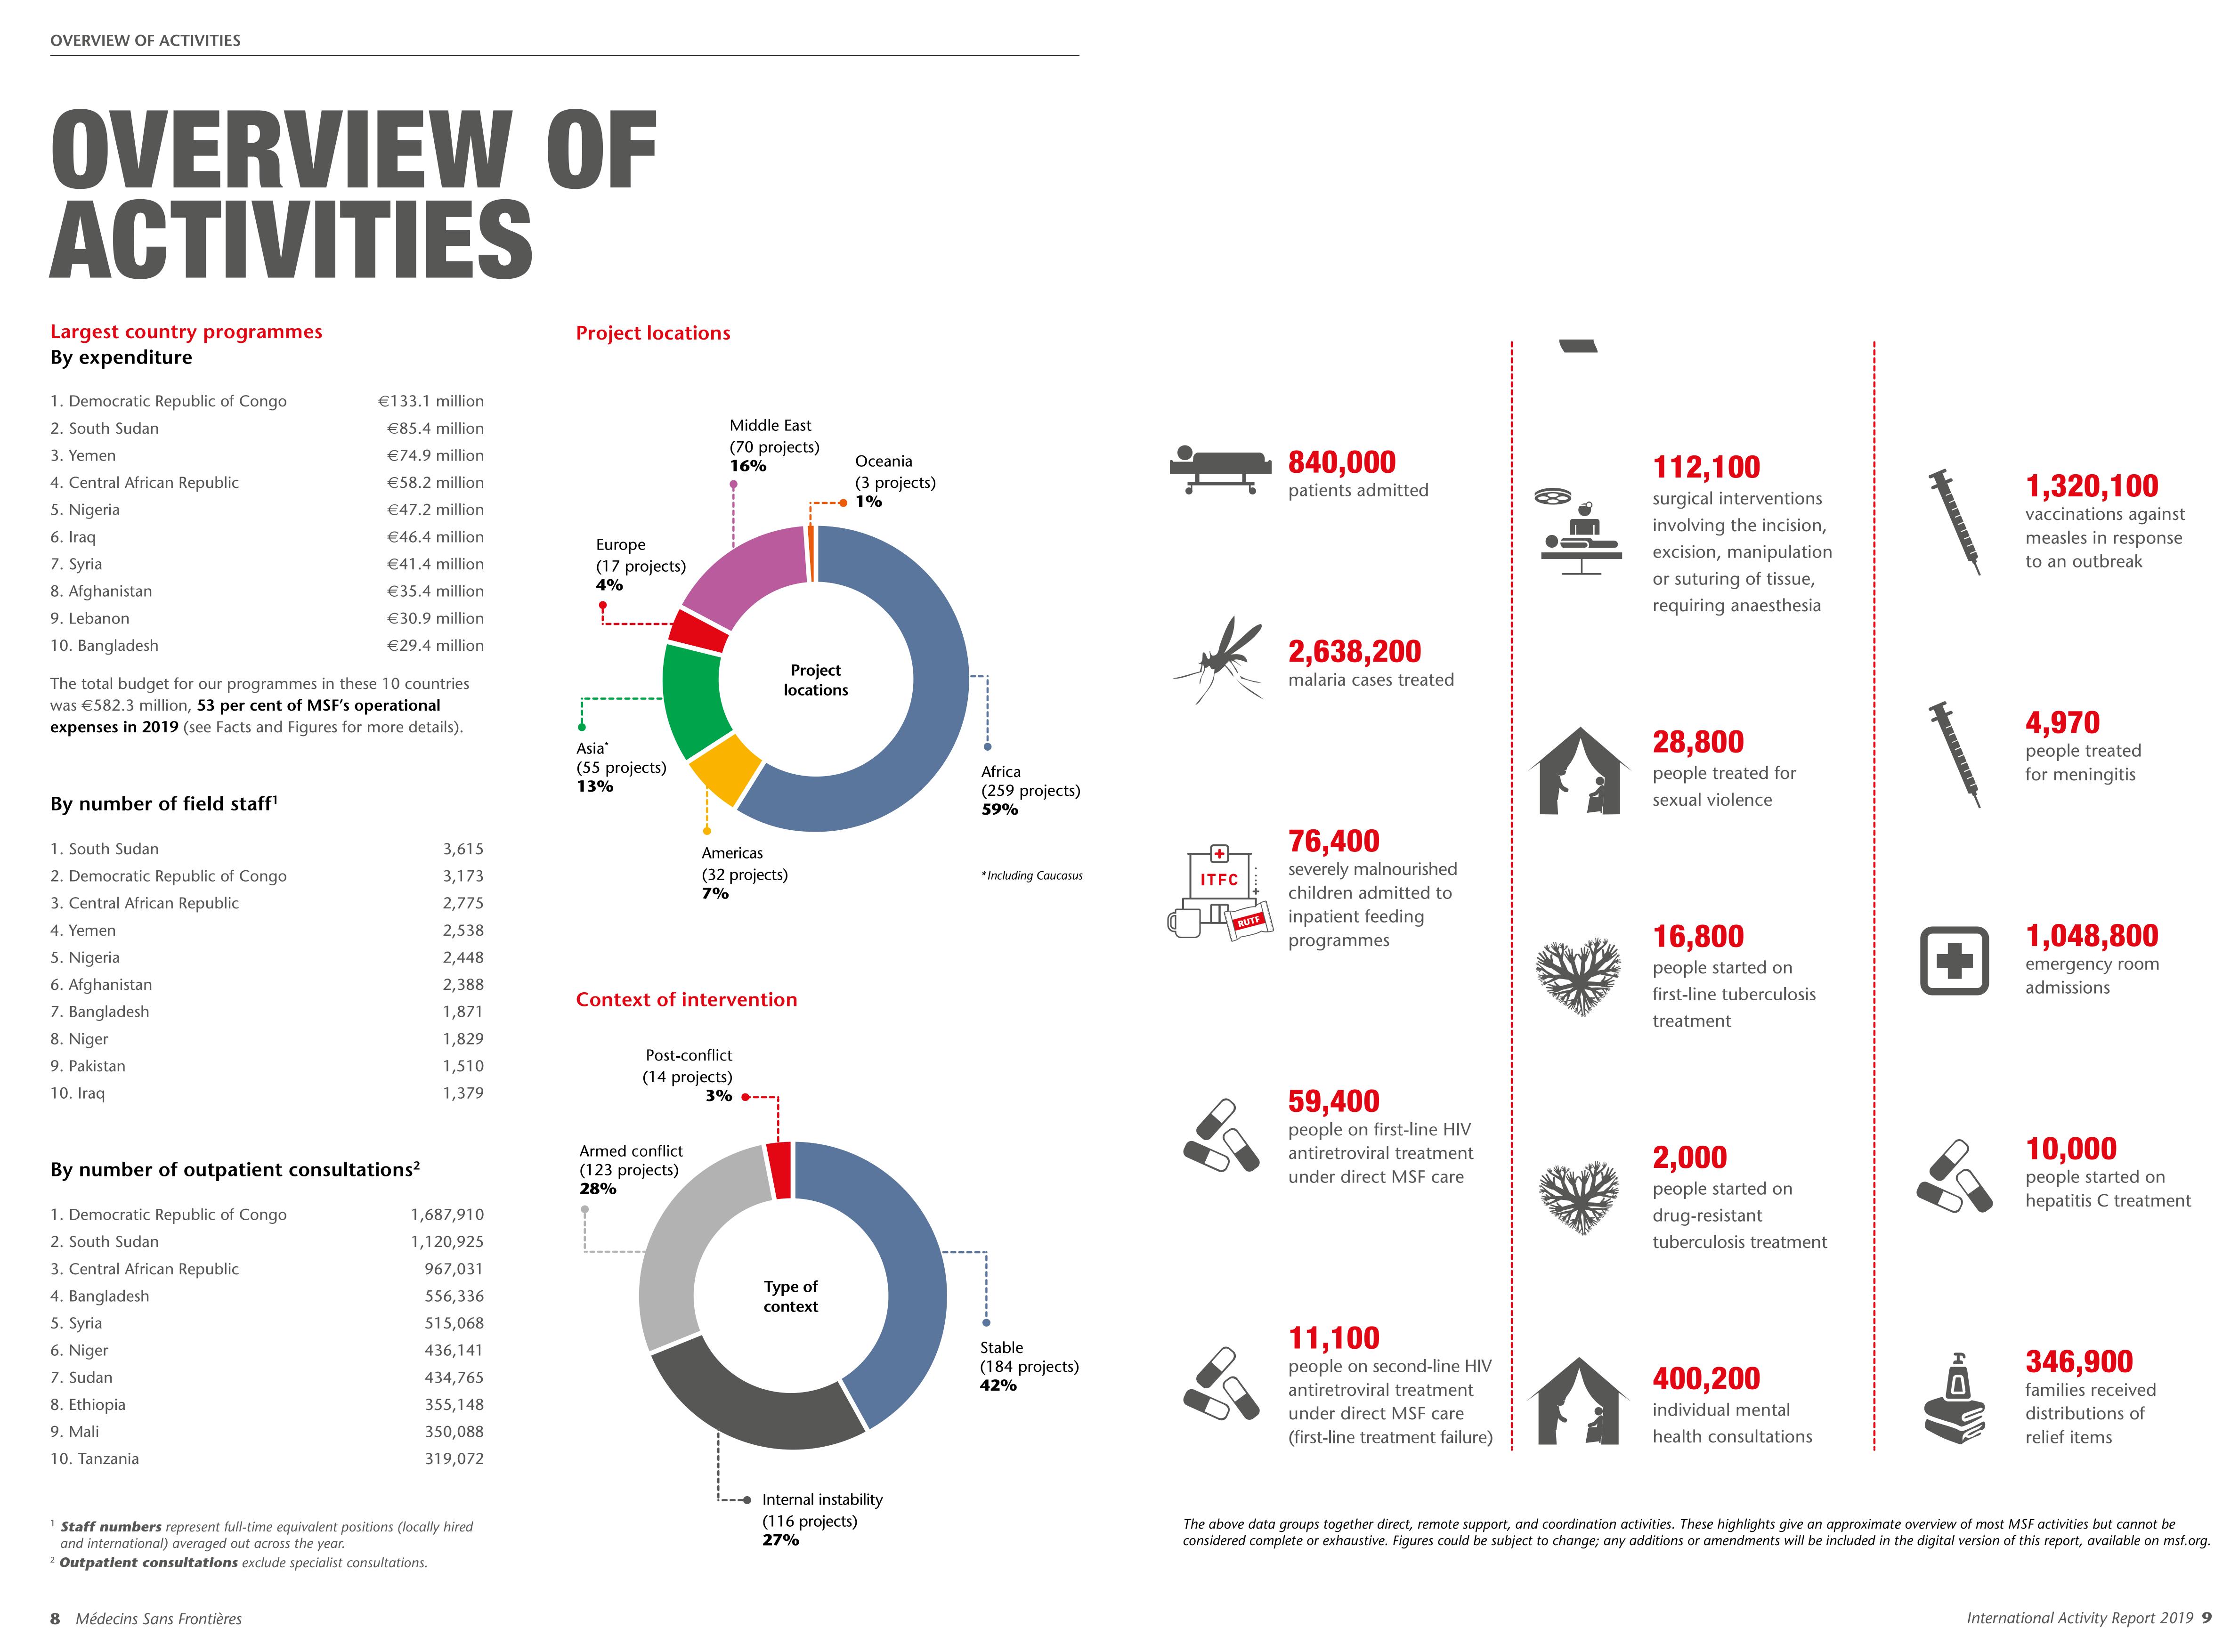 msf international activity report 2019